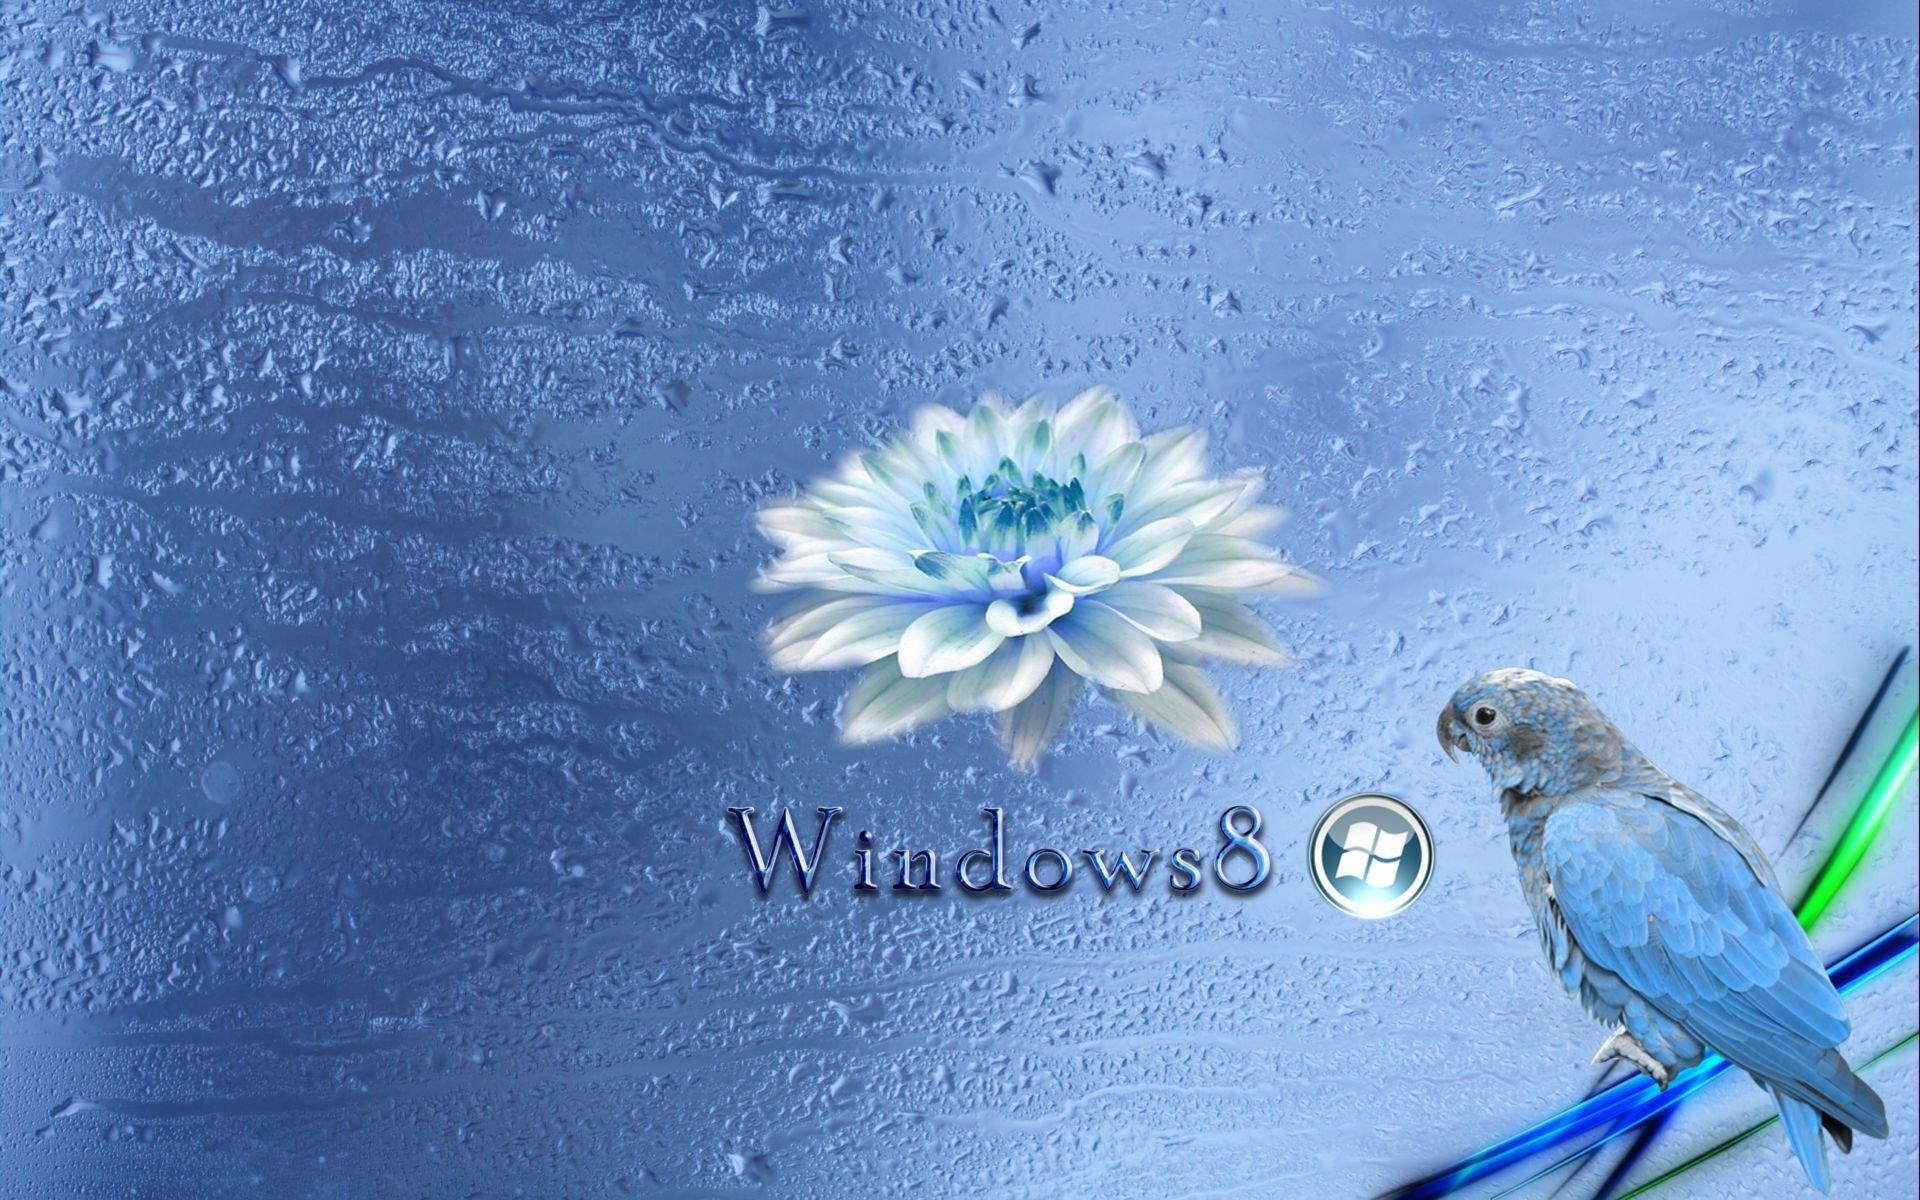 Px Windows 8 Image For Large Desktop By Bainbridge Gill